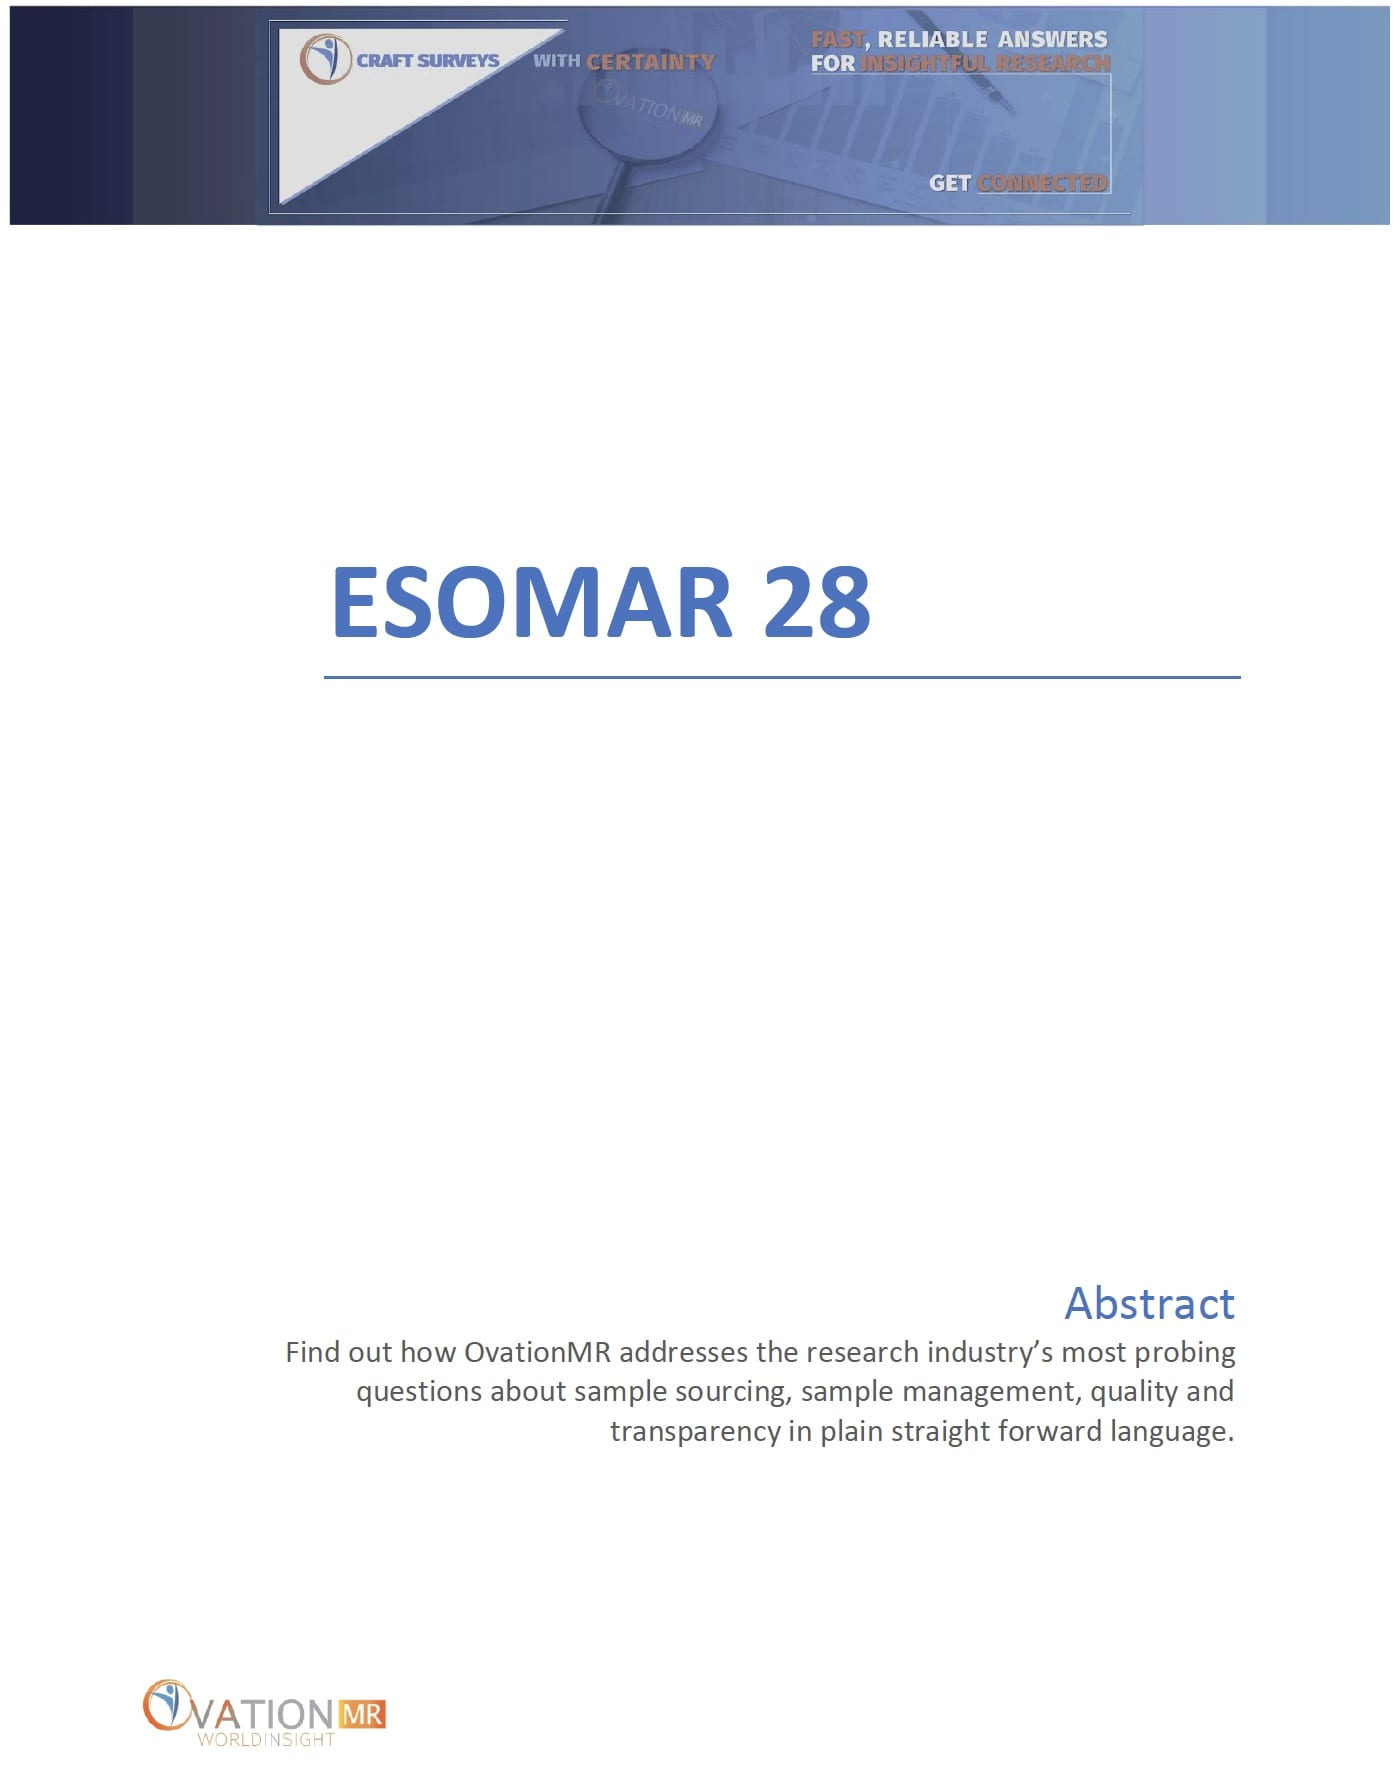 ESOMAR28 Cover 2021